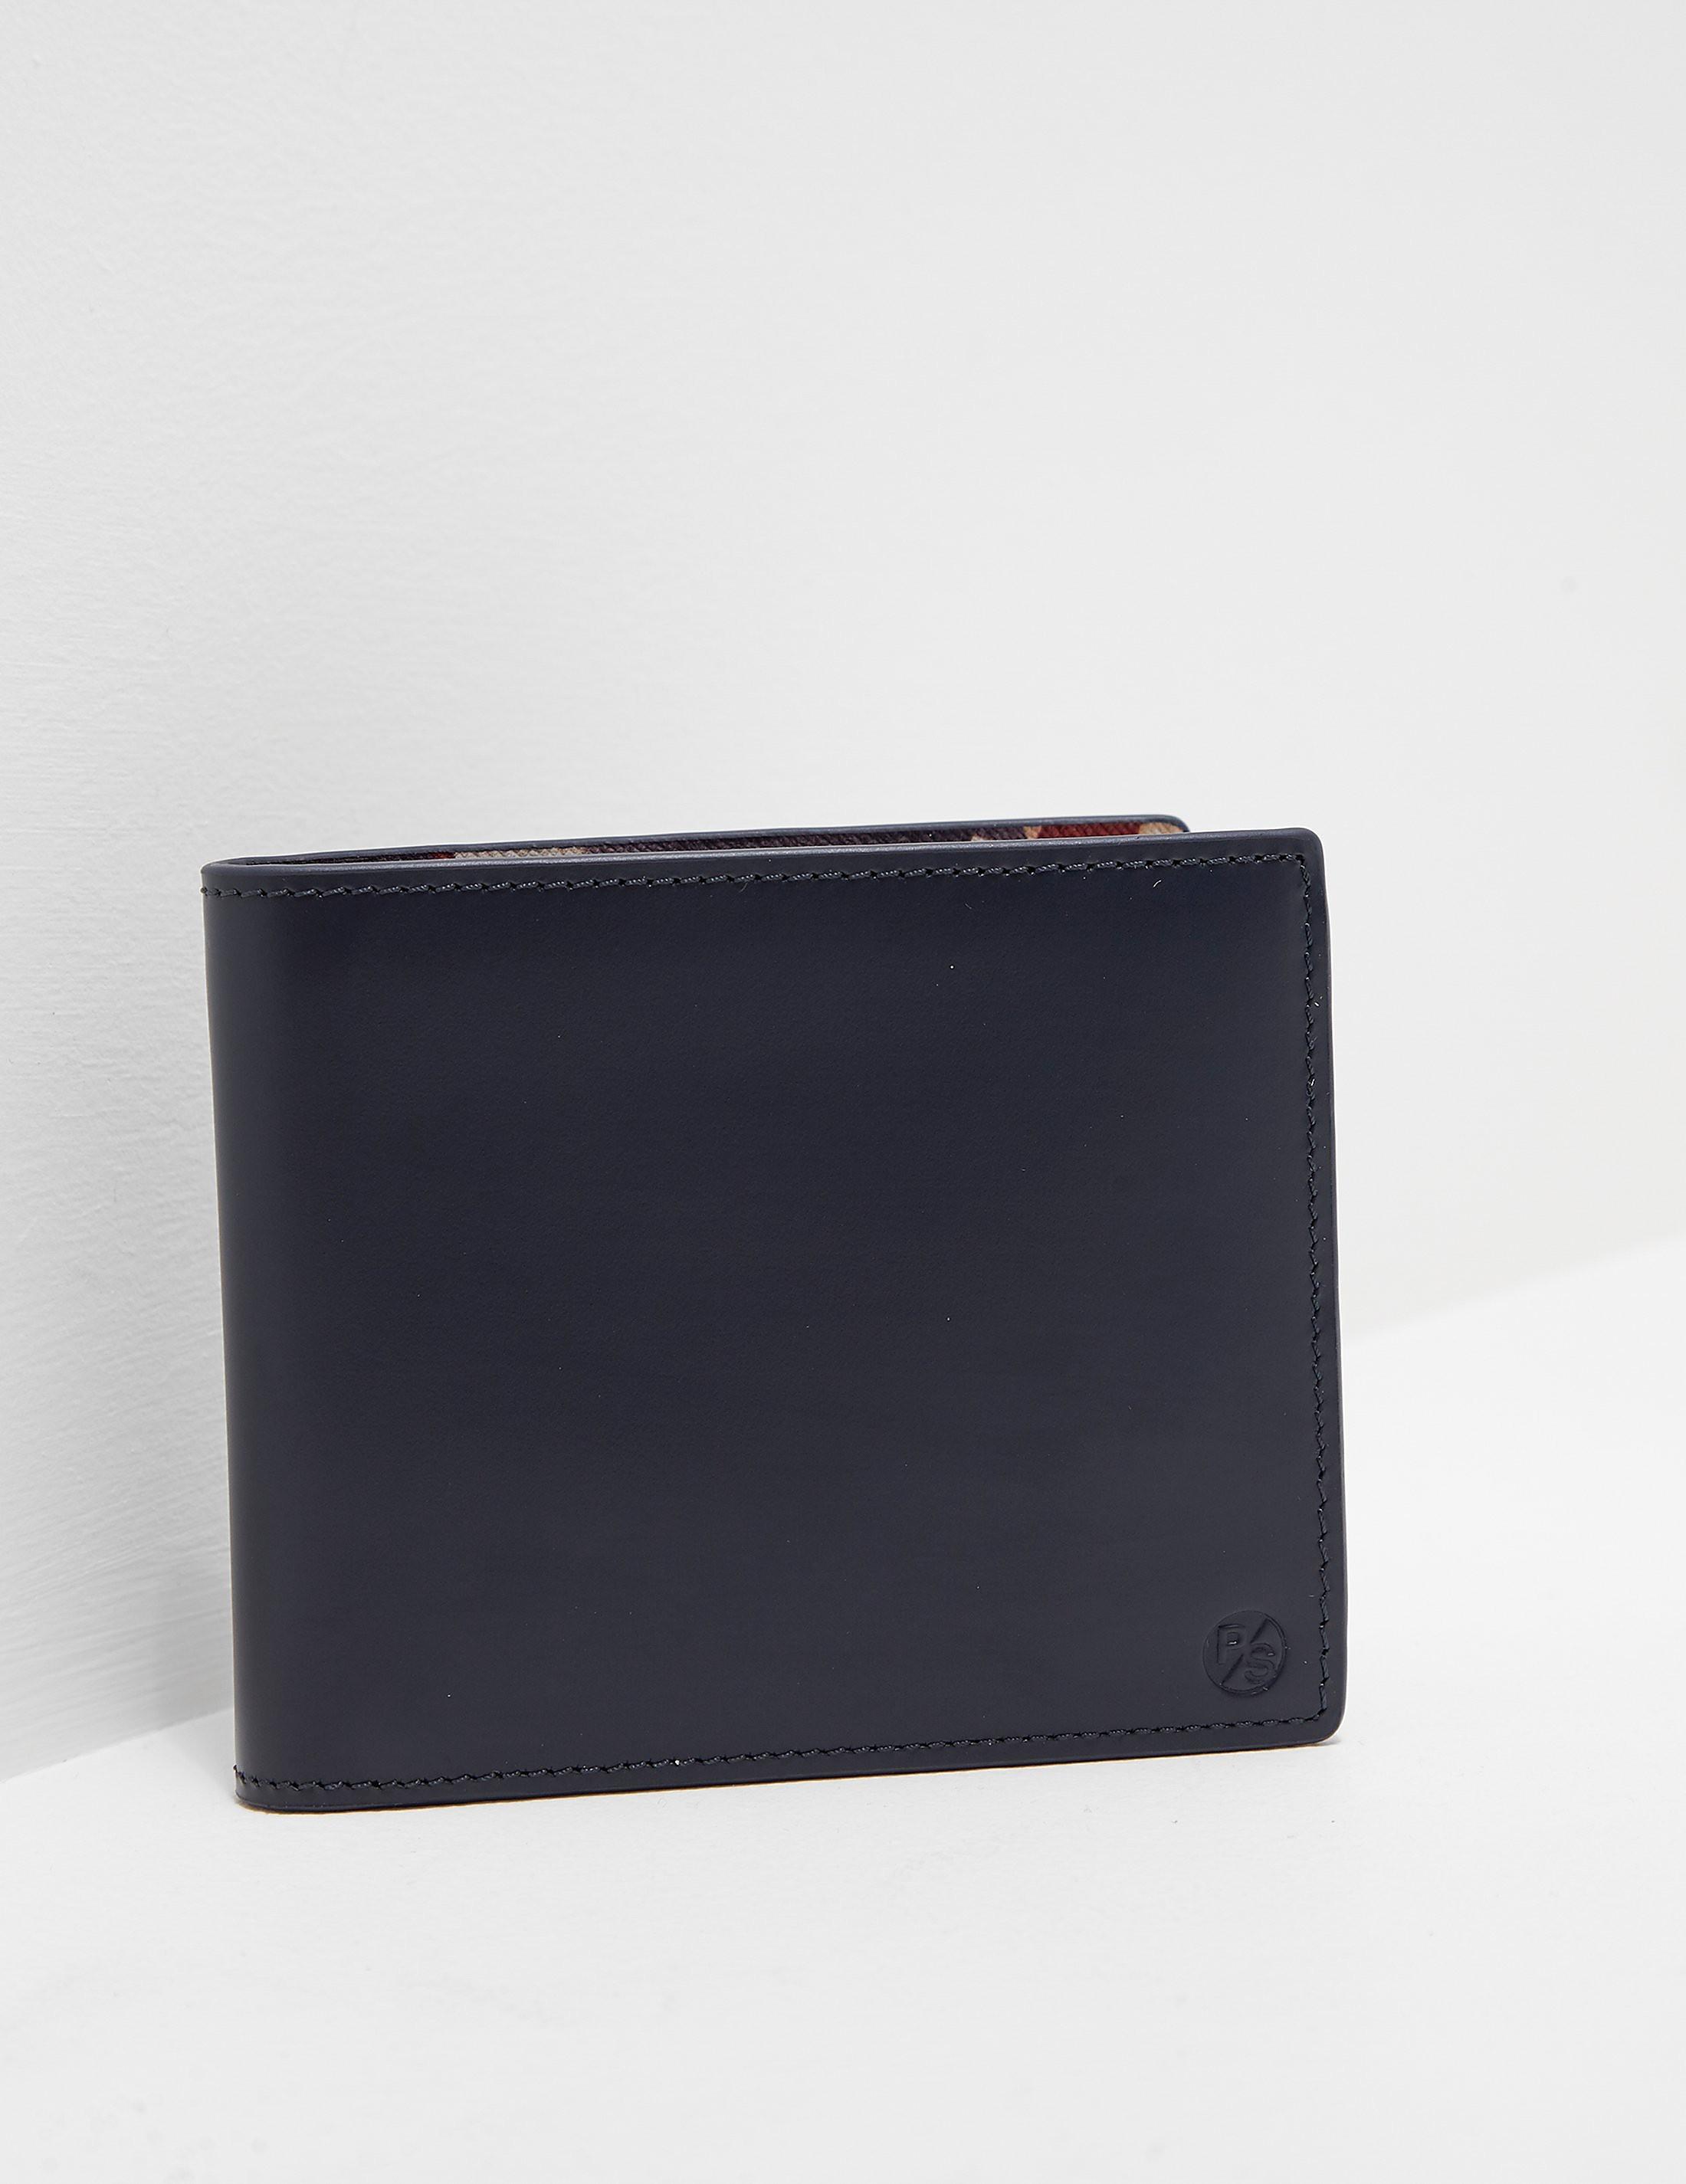 Paul Smith Union Jack Wallet